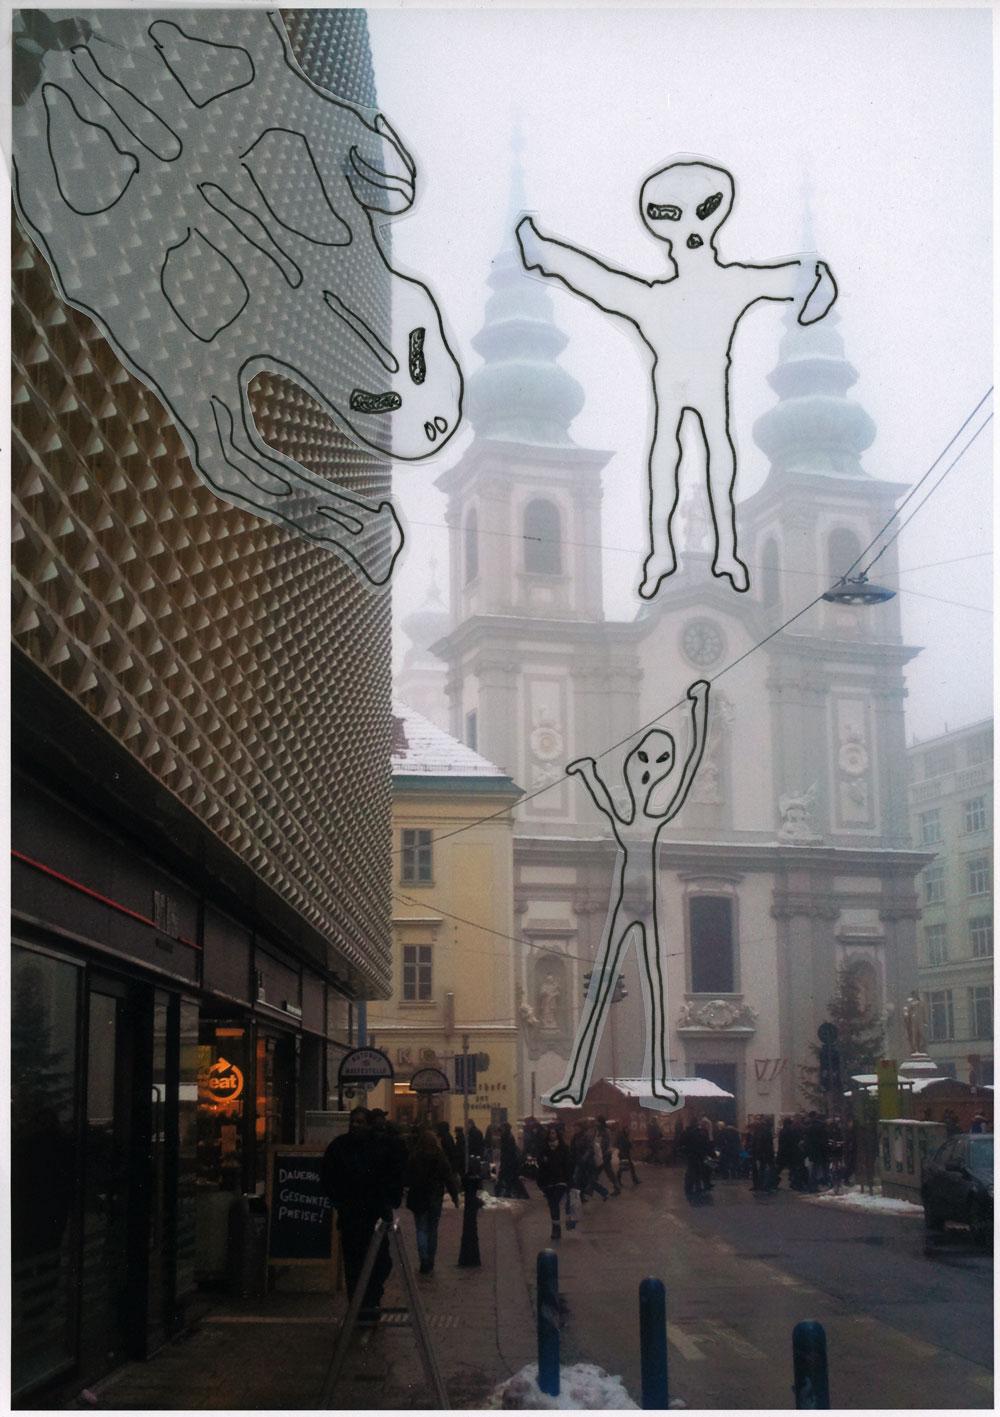 Be Creative #36 - creepy fogmonsters, © Ines Häufler